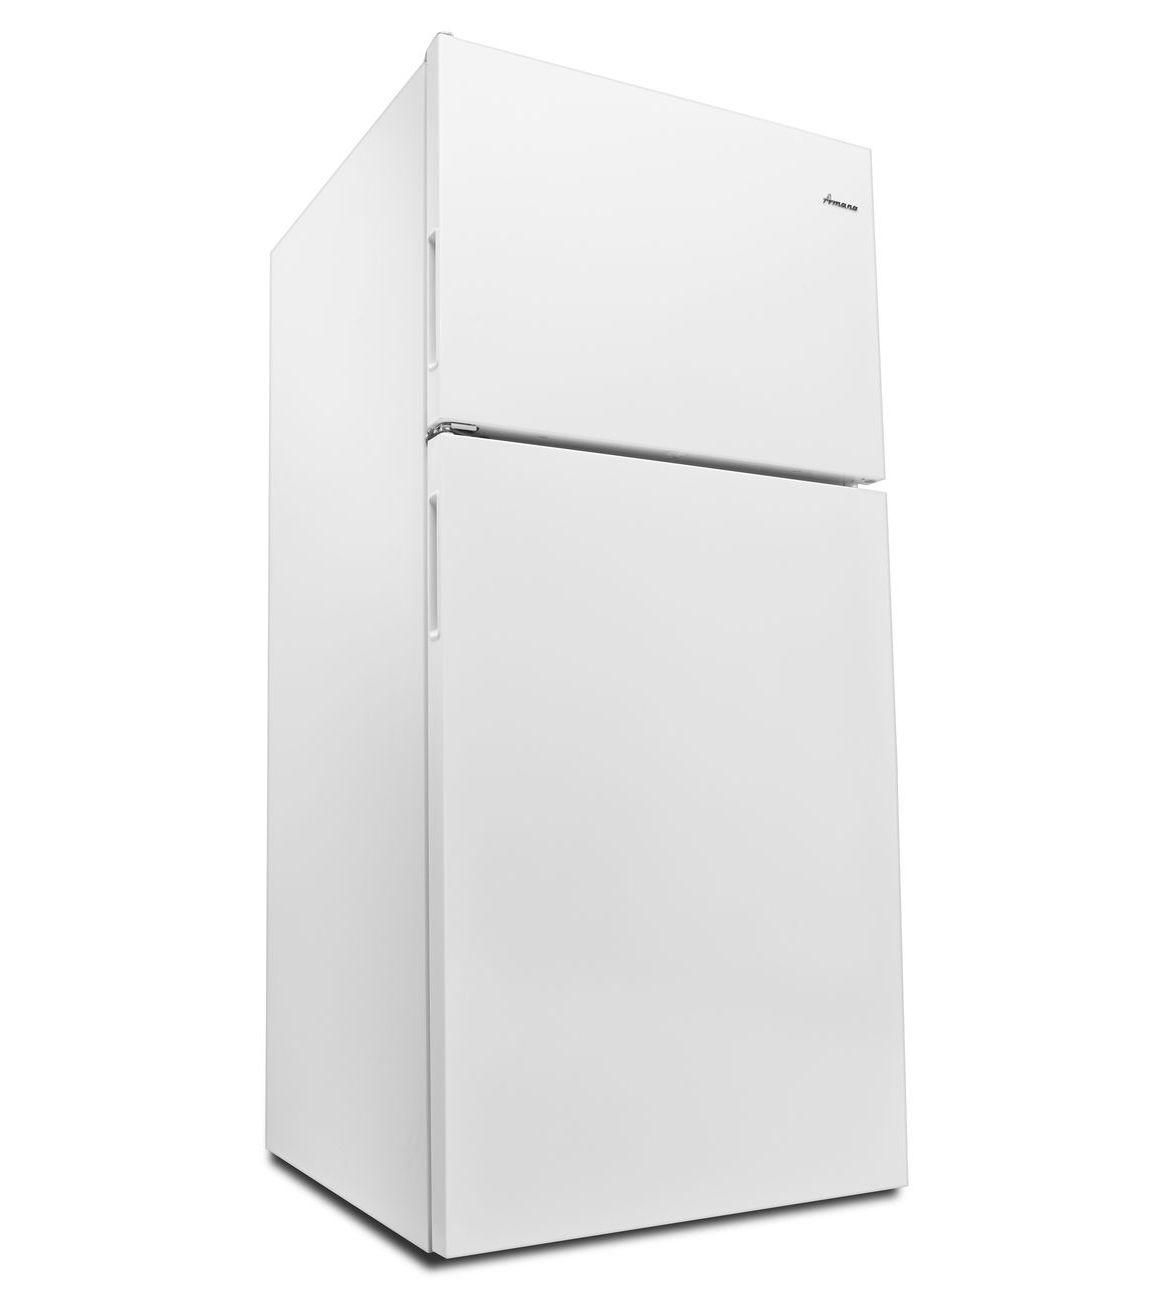 (ART318FFDW) Amana® 30-inch Wide Top-Freezer Refrigerator ... Amana Appliances